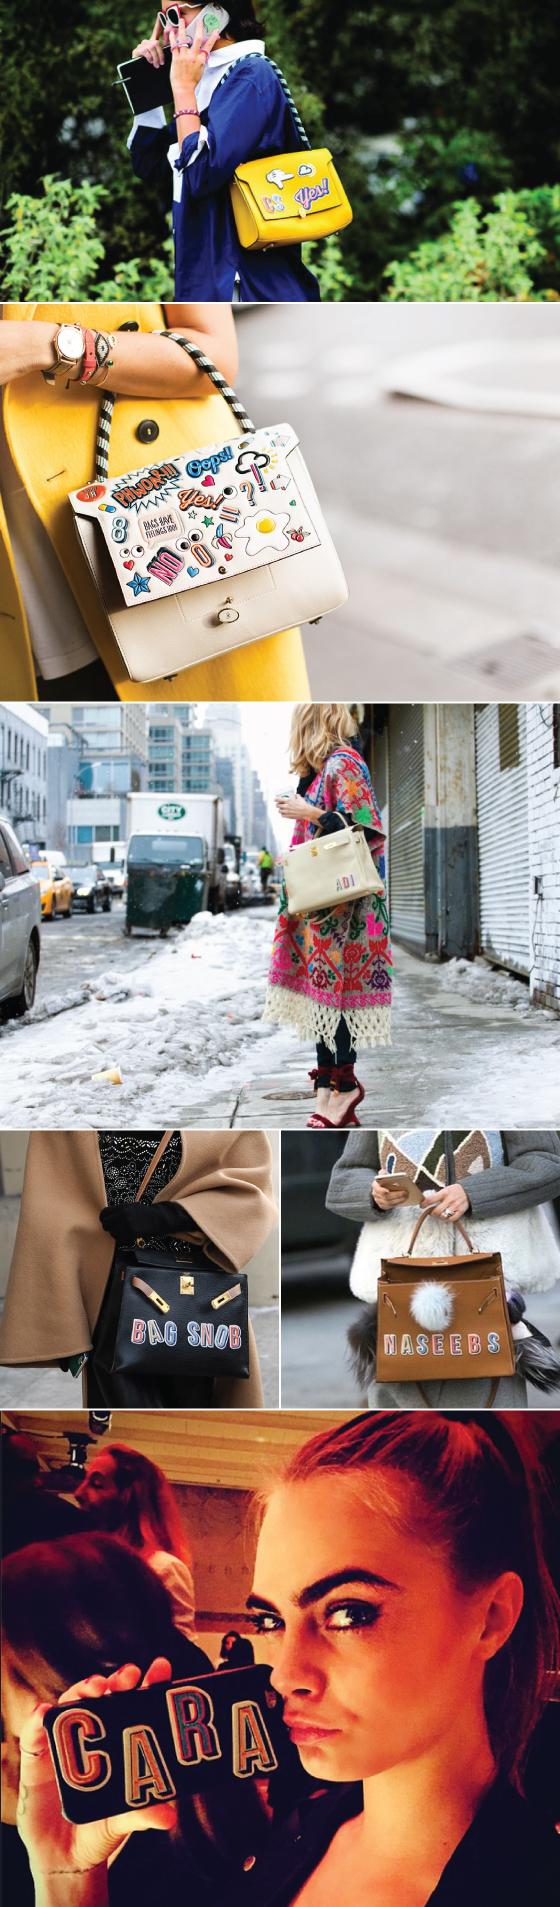 anya-hindmarch-leather-sticker-adesivo-couro-acessorio-street-style-lfw-nyfw-estilo-look-bolsa-bag-london-londres-cara-delevigne